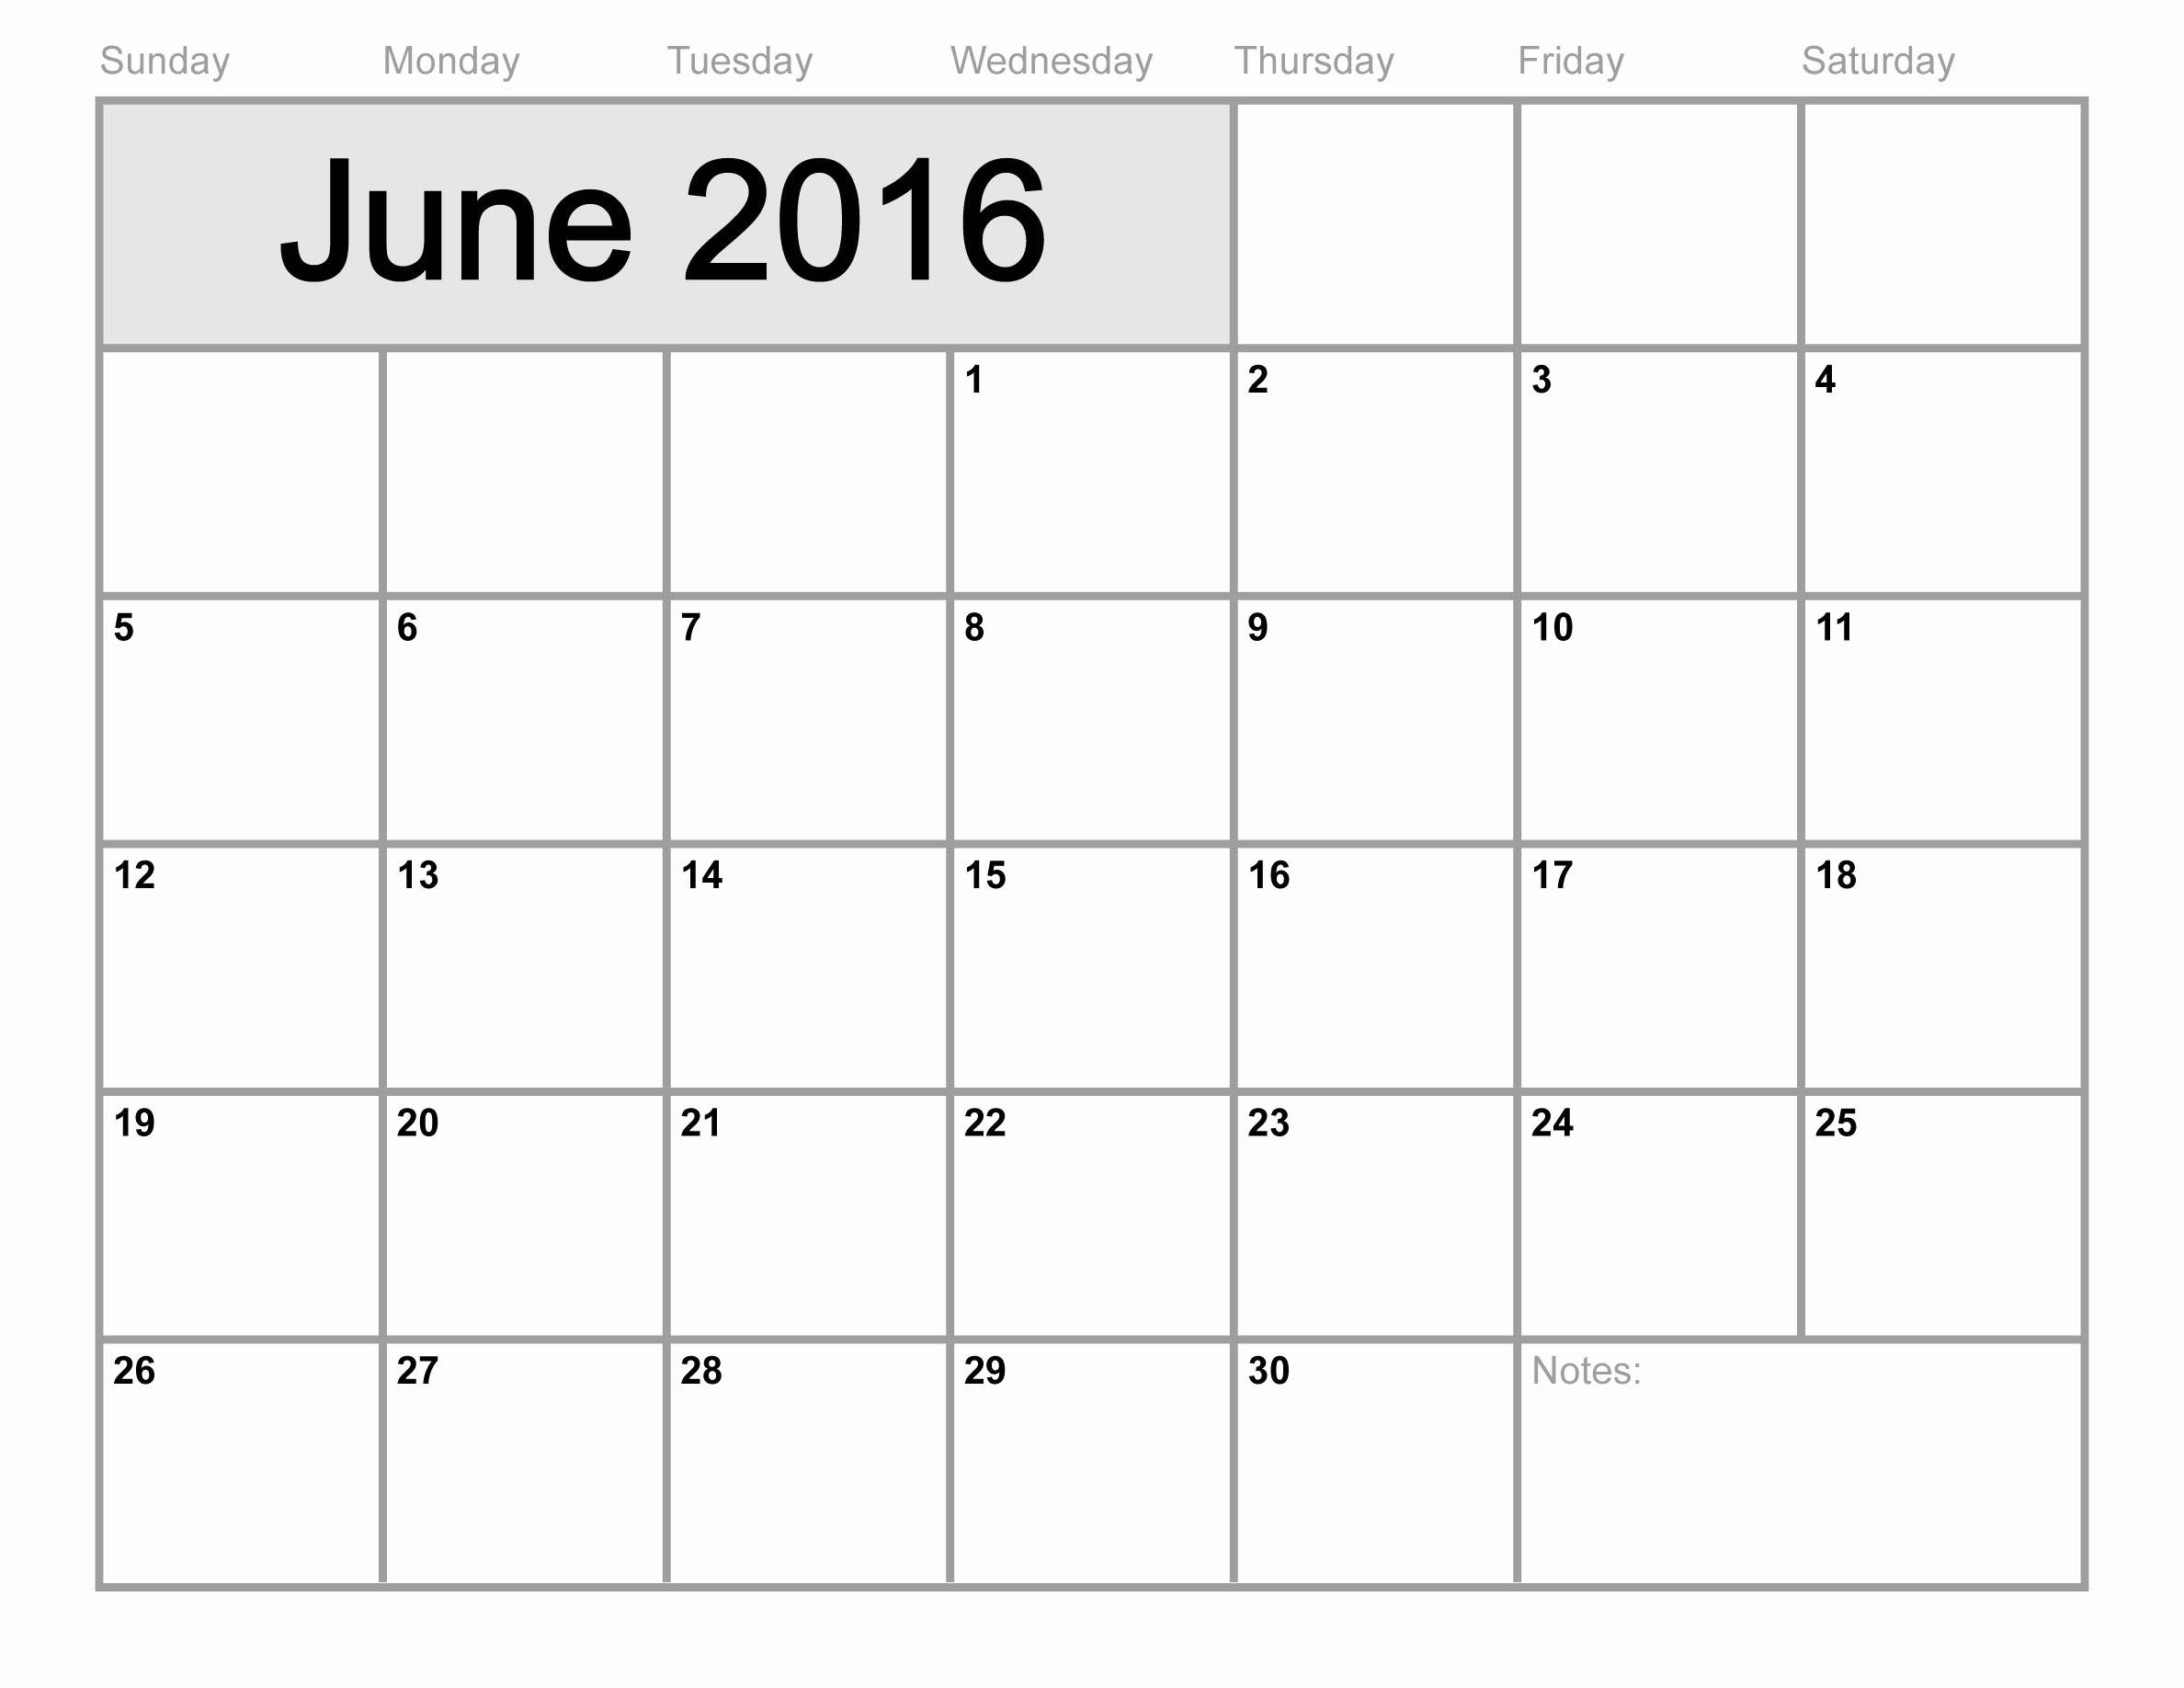 Free Downloadable 2016 Calendar Template Inspirational June 2016 Printable Calendar Blank Templates